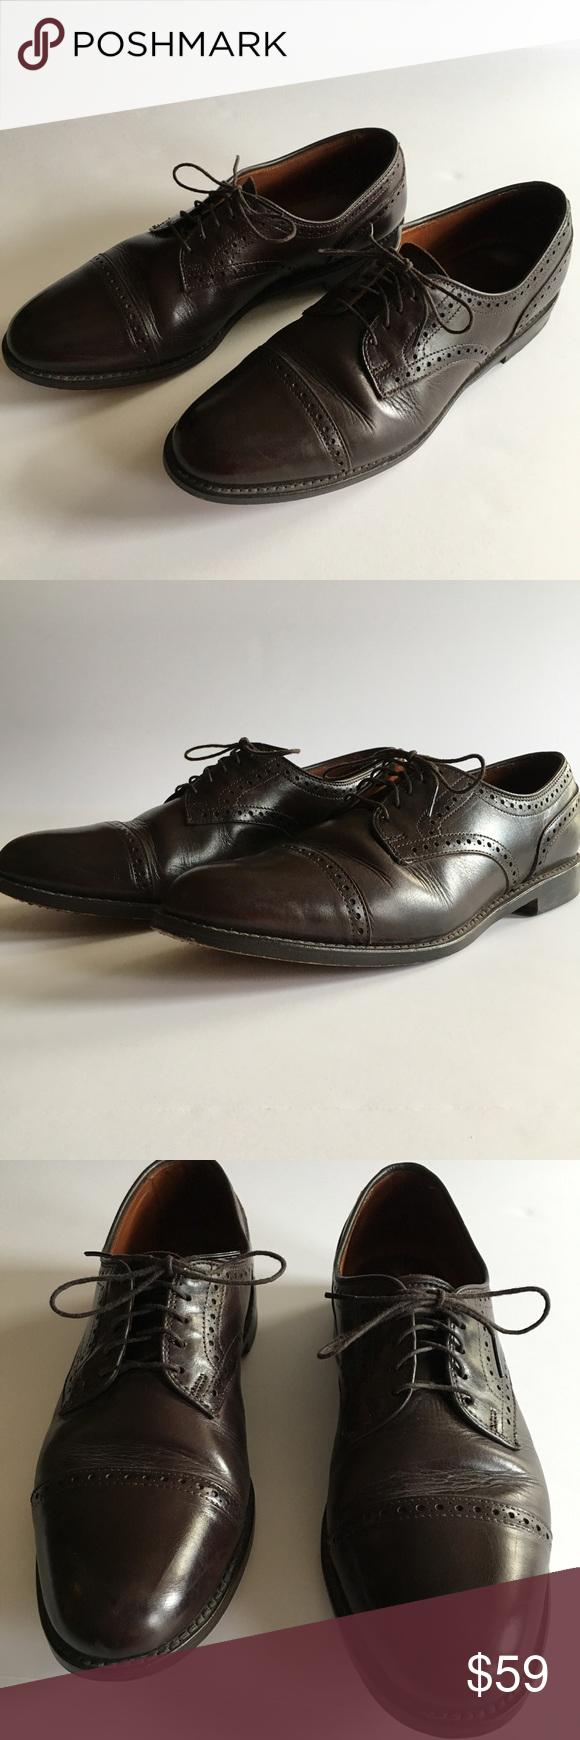 Allen edmonds townley b dark brown dress shoes allen edmonds